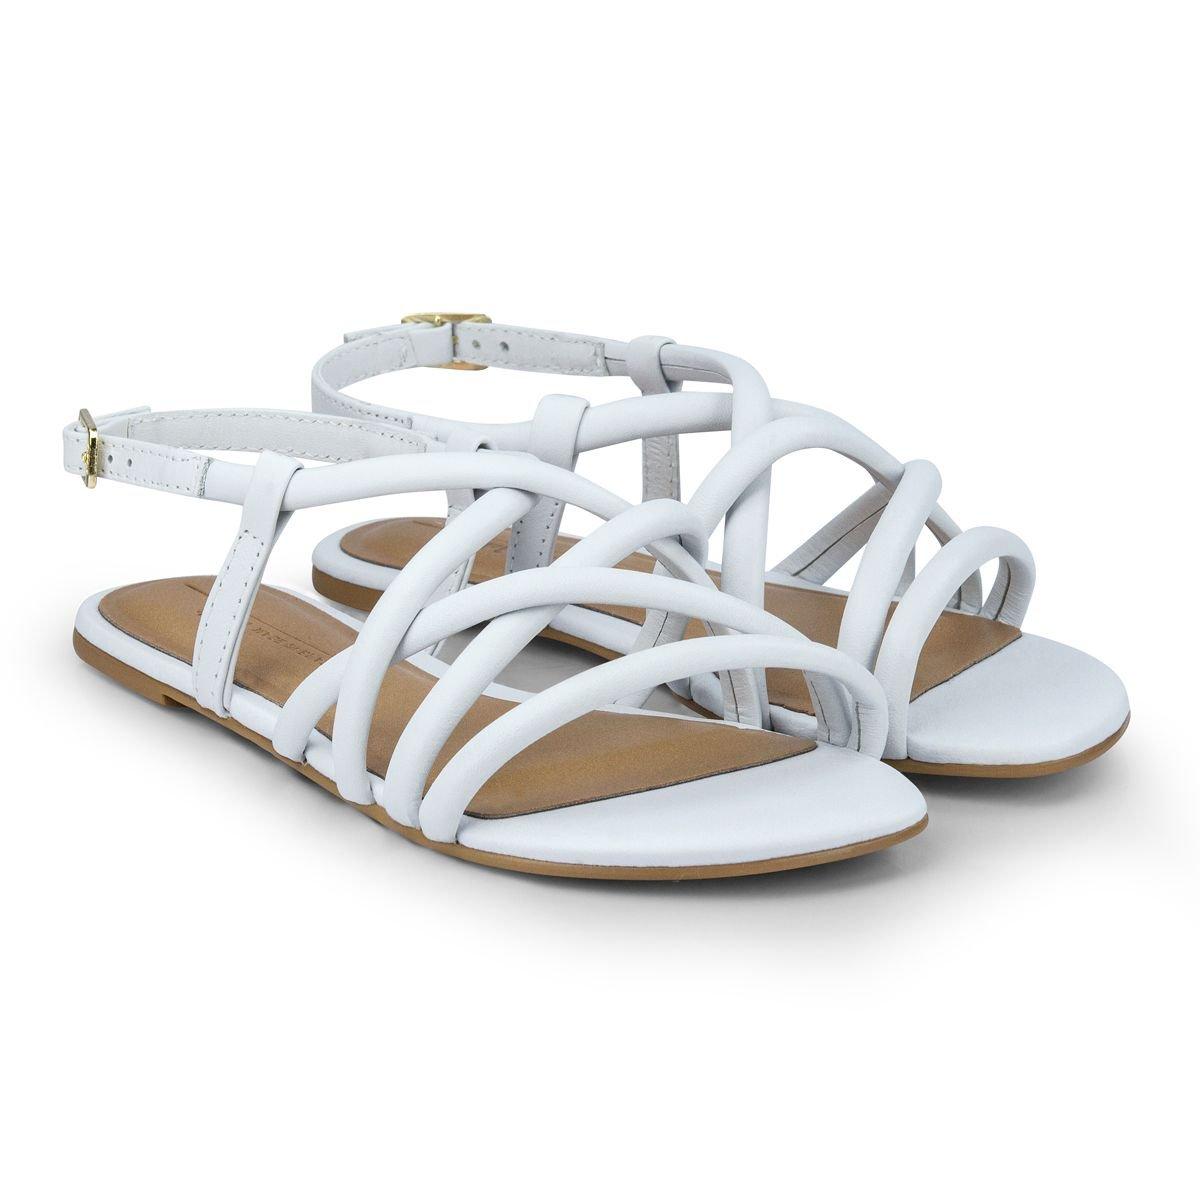 Sandale din piele Bibi Shoes Little Me Ice, Alb